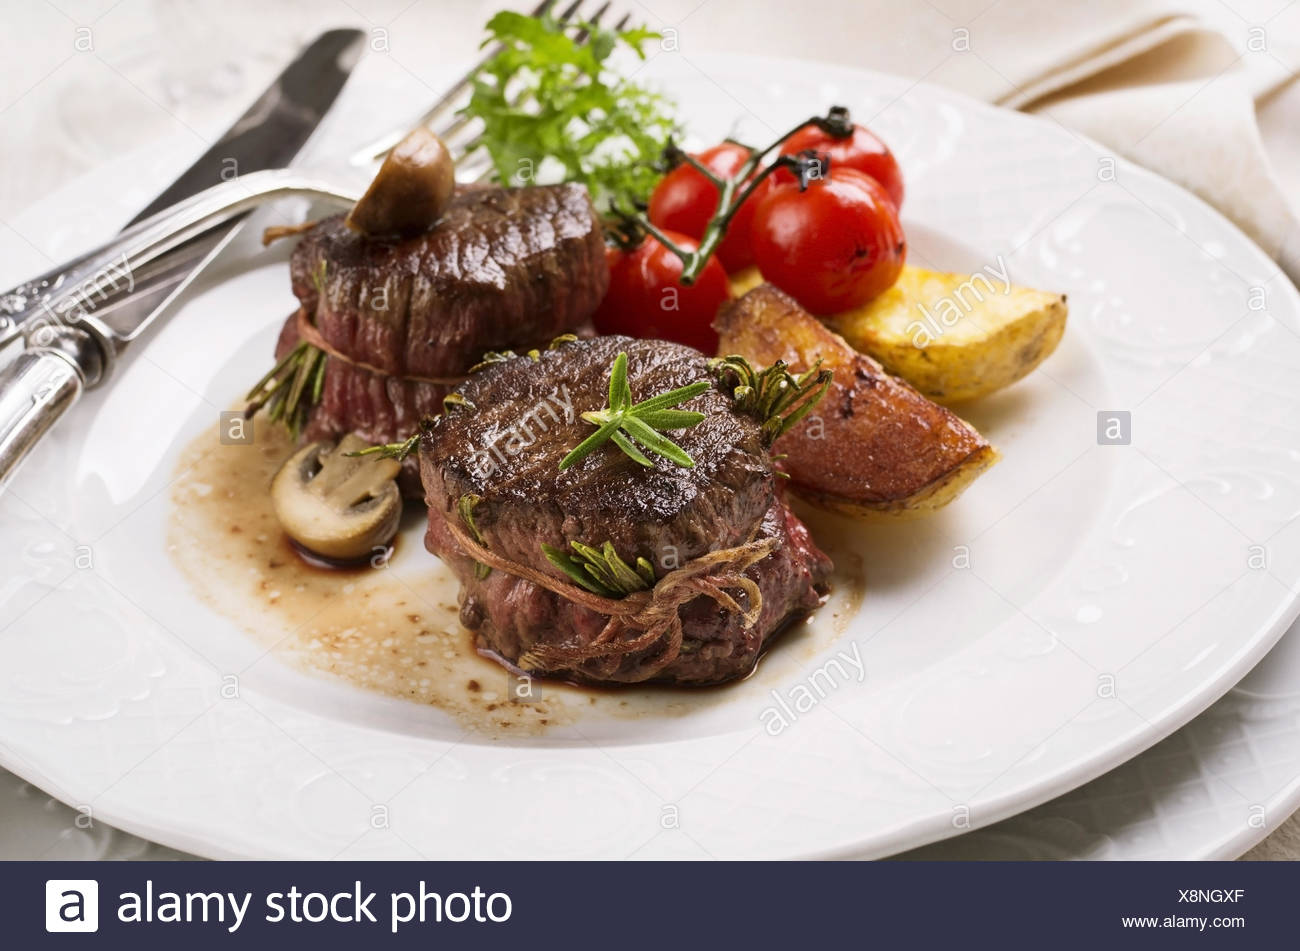 beef edallions - Stock Image